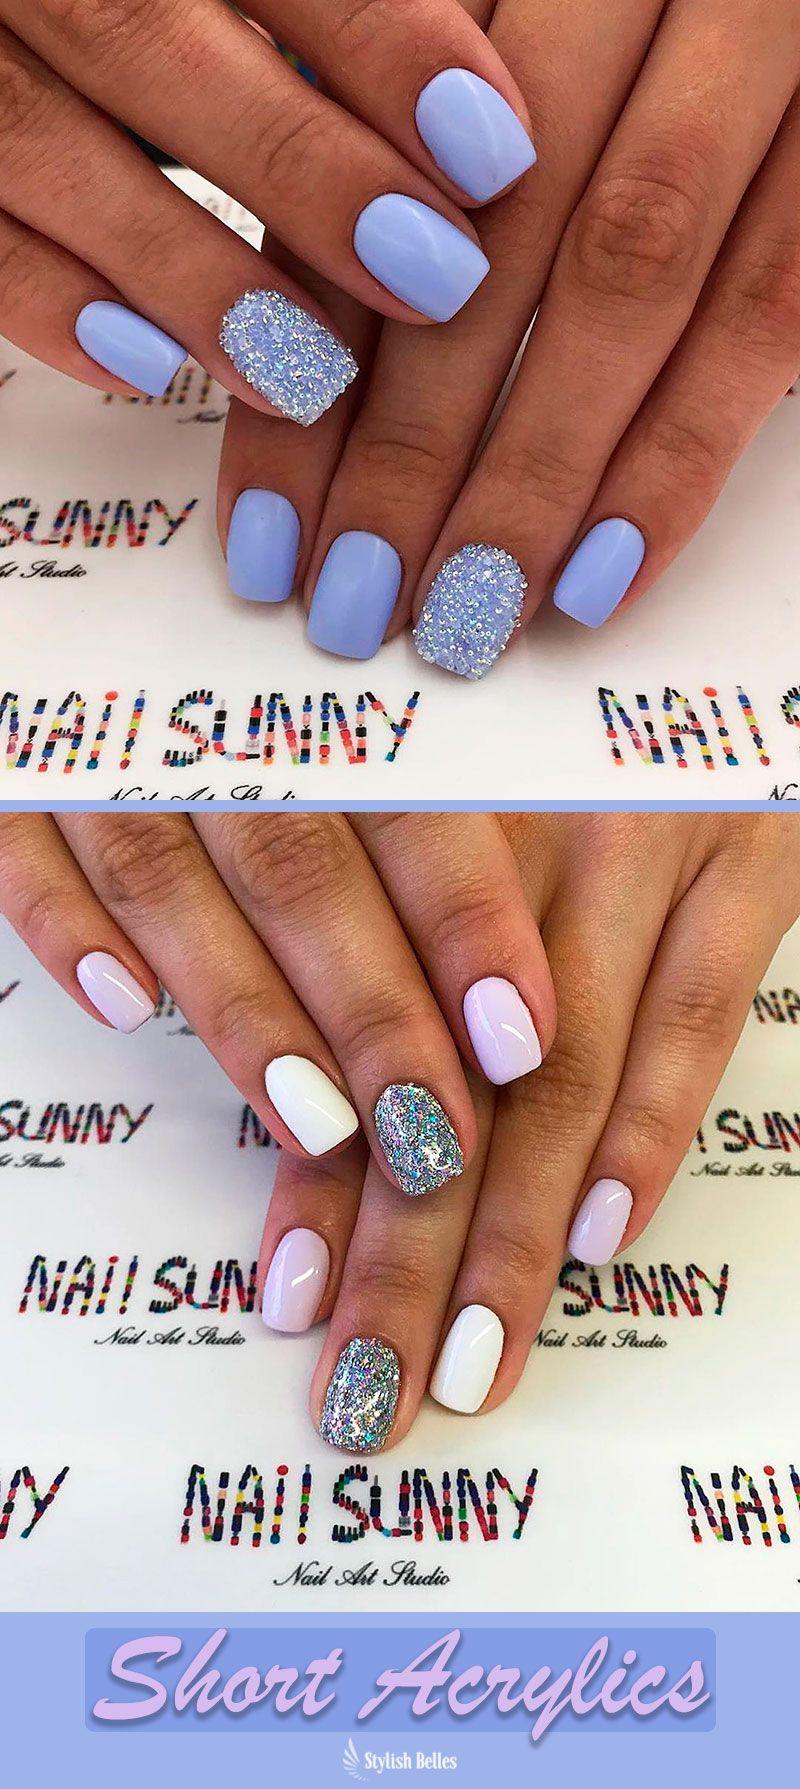 So Cute Short Acrylic Nails Ideas You Will Love Them Short Acrylic Nails Winter Nails Acrylic Shiny Nails Designs